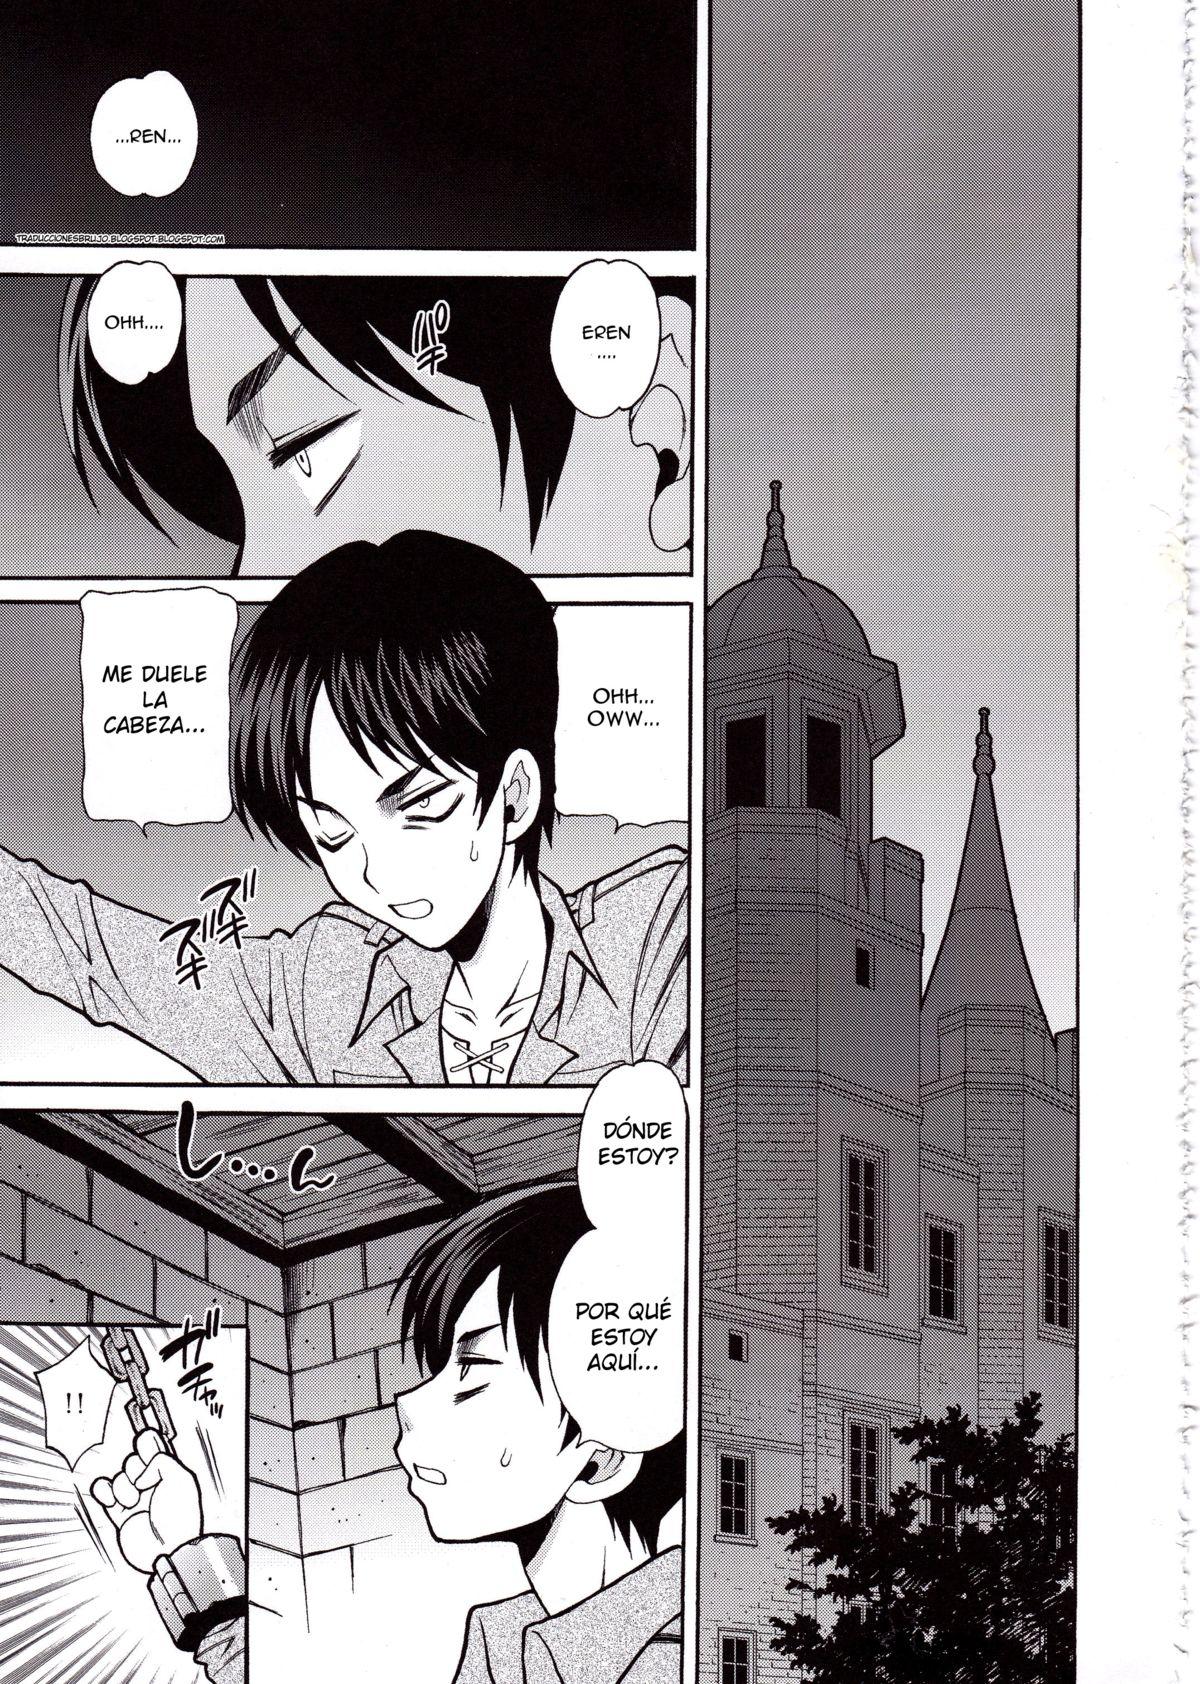 Ataque a la Investigadora - Shingeki no kyojin